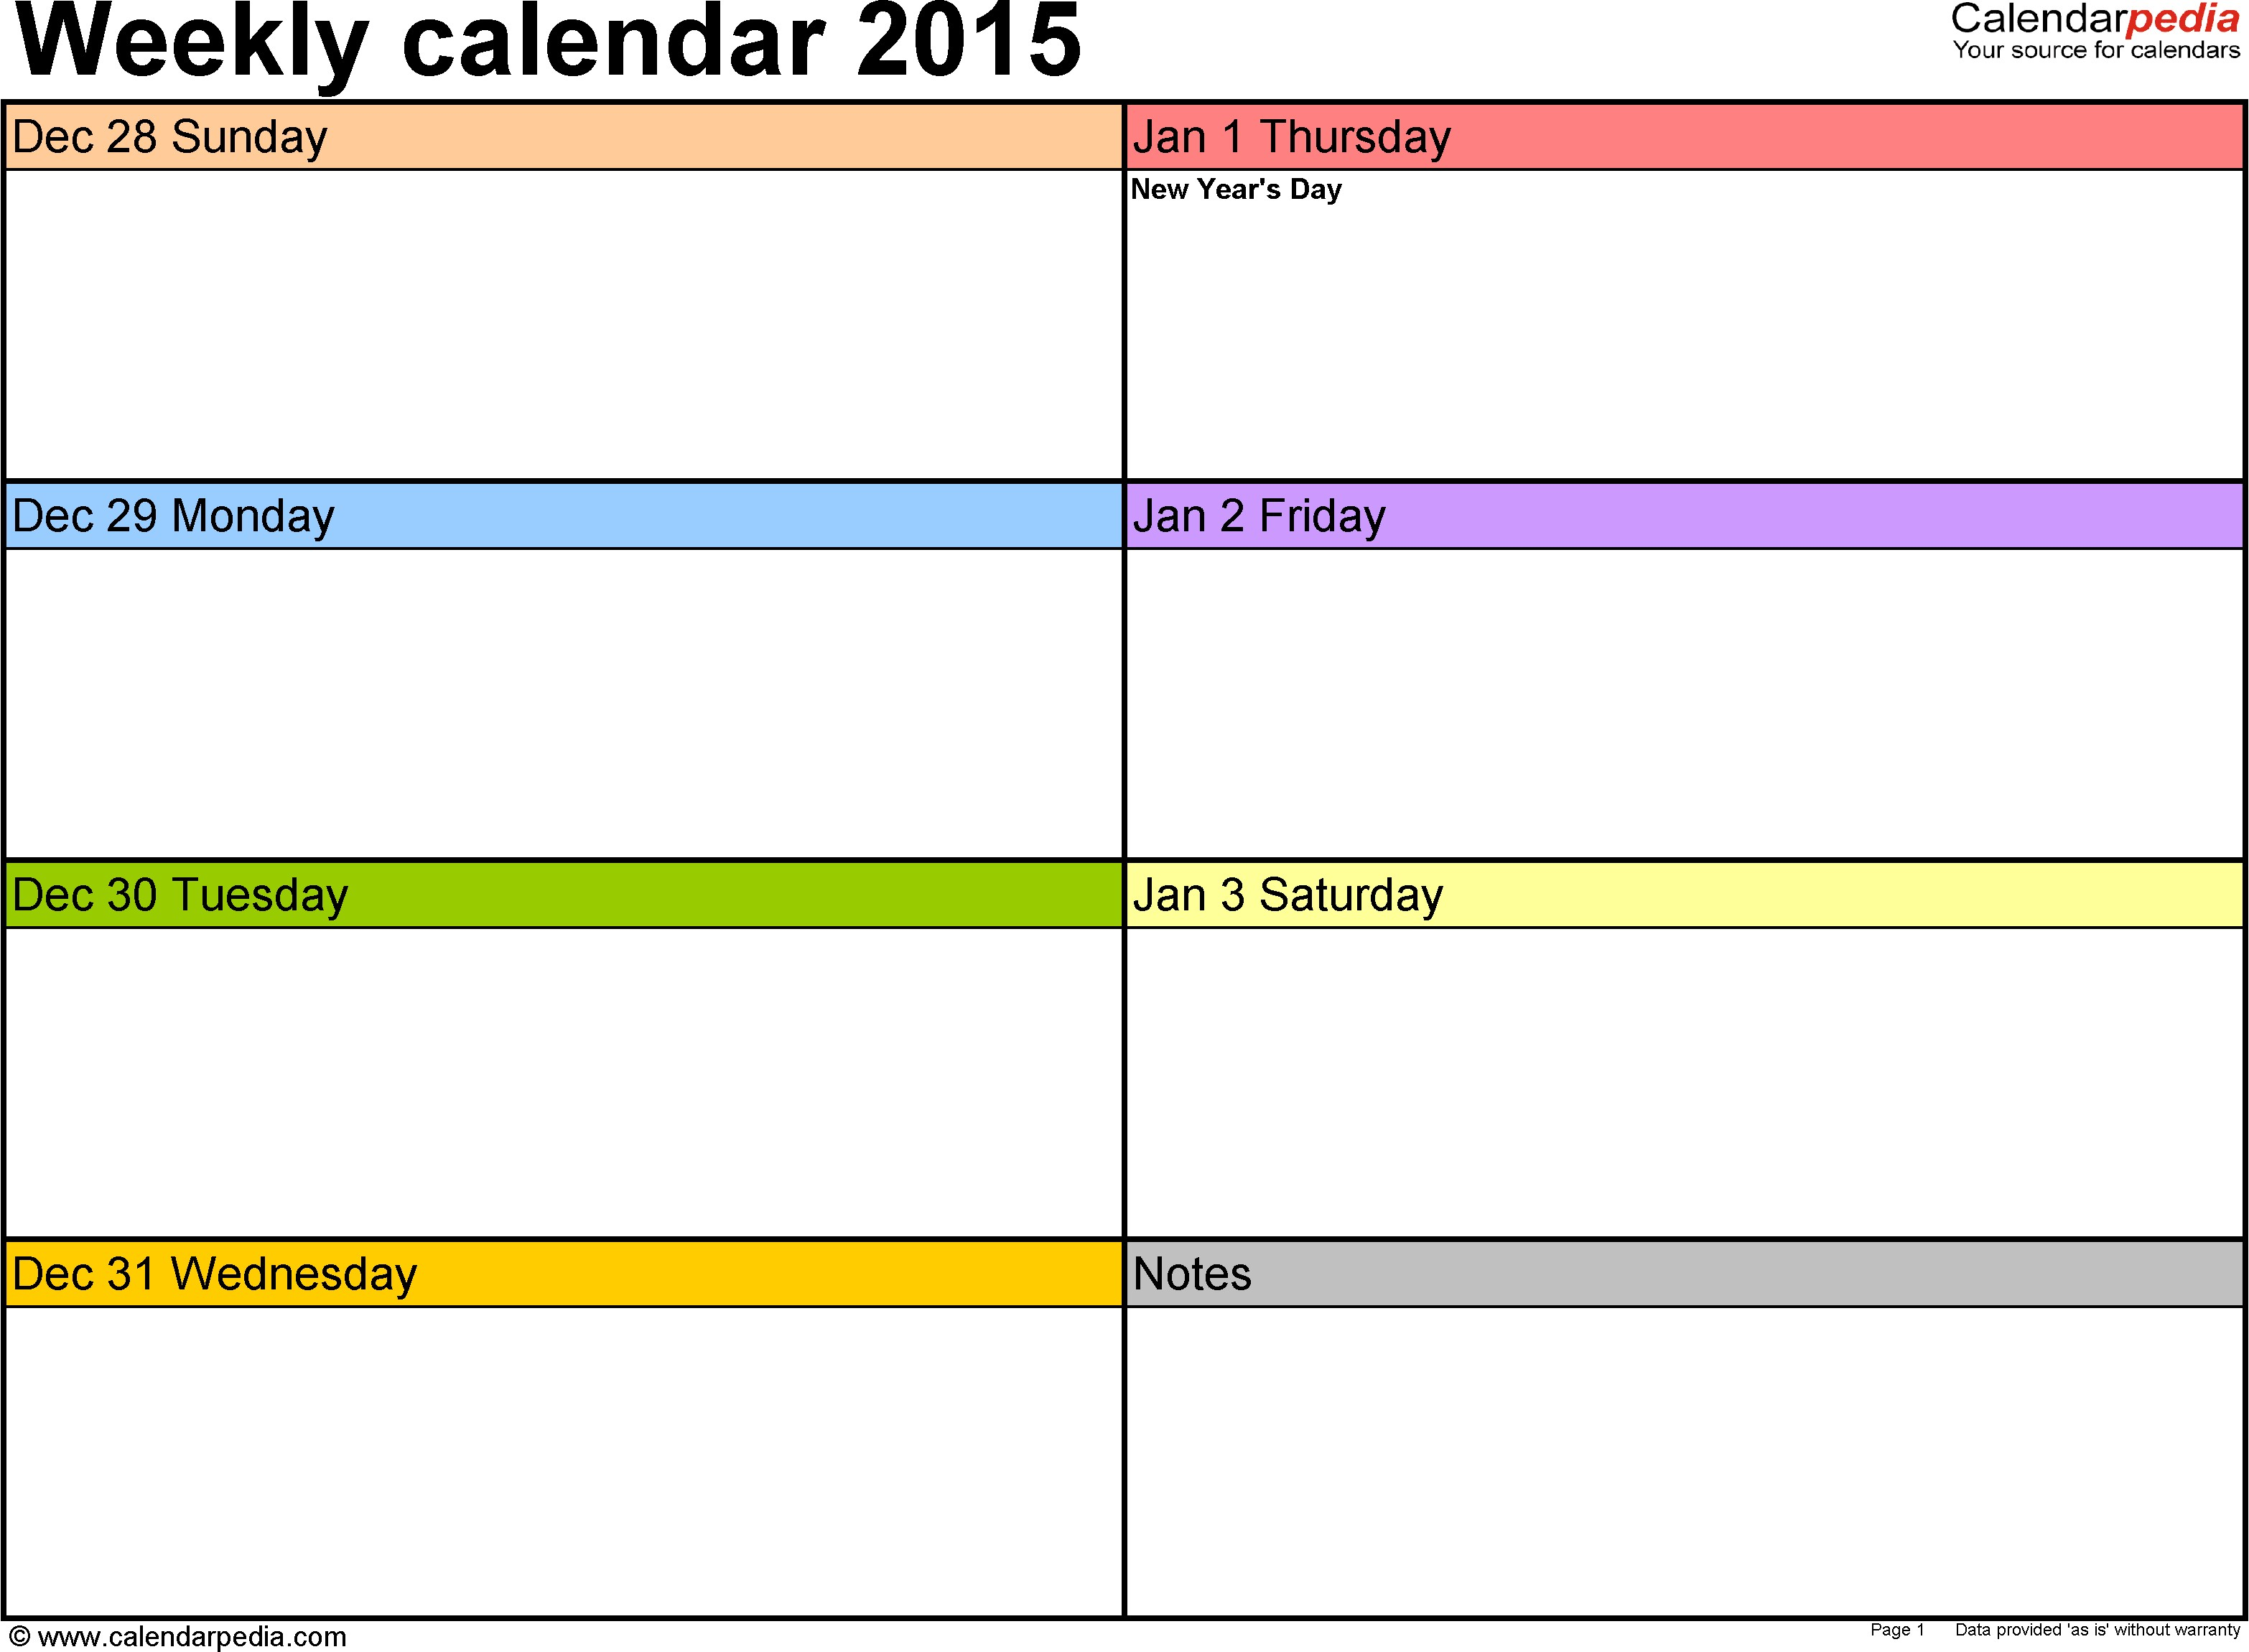 Printable One Week Calendar Weekly Calendar 2015 for Pdf 12 Free Printable Templates